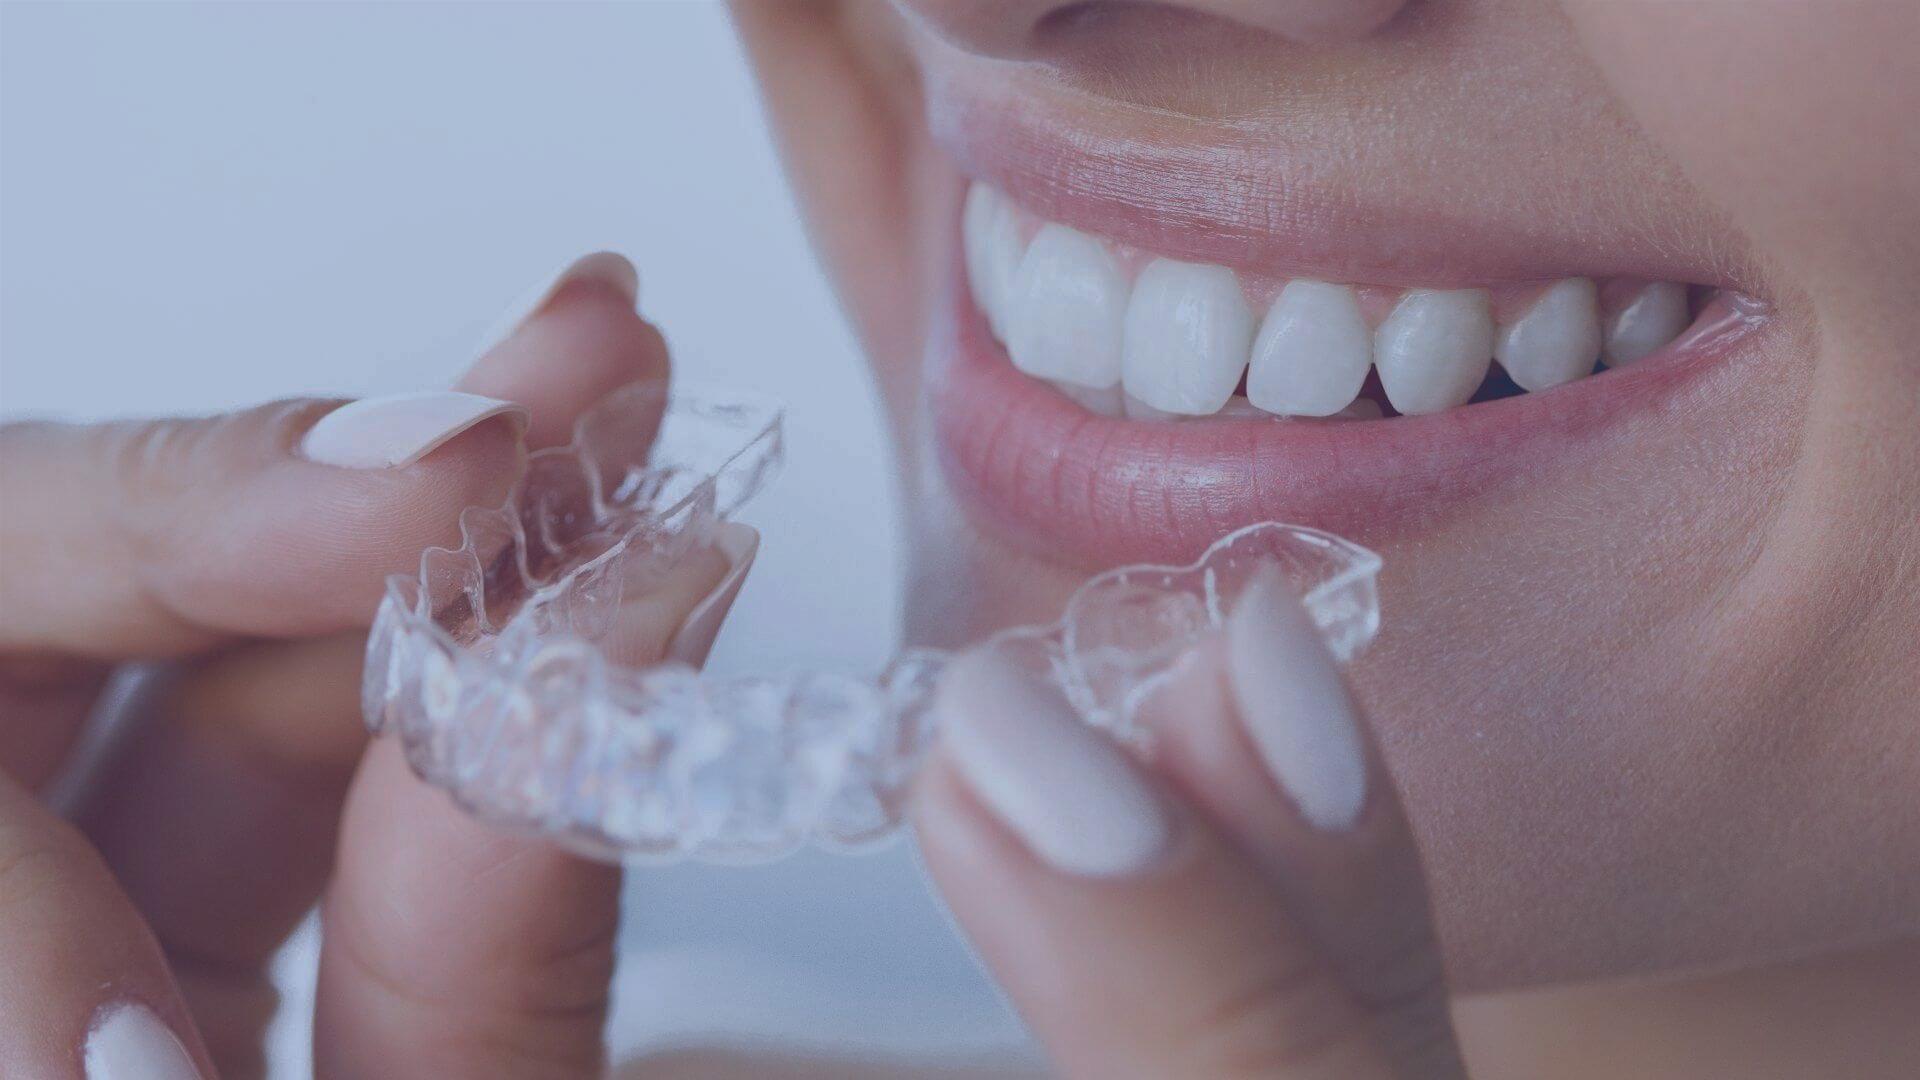 Solución Dental - Odontolgía estética especializada - Ortodoncia